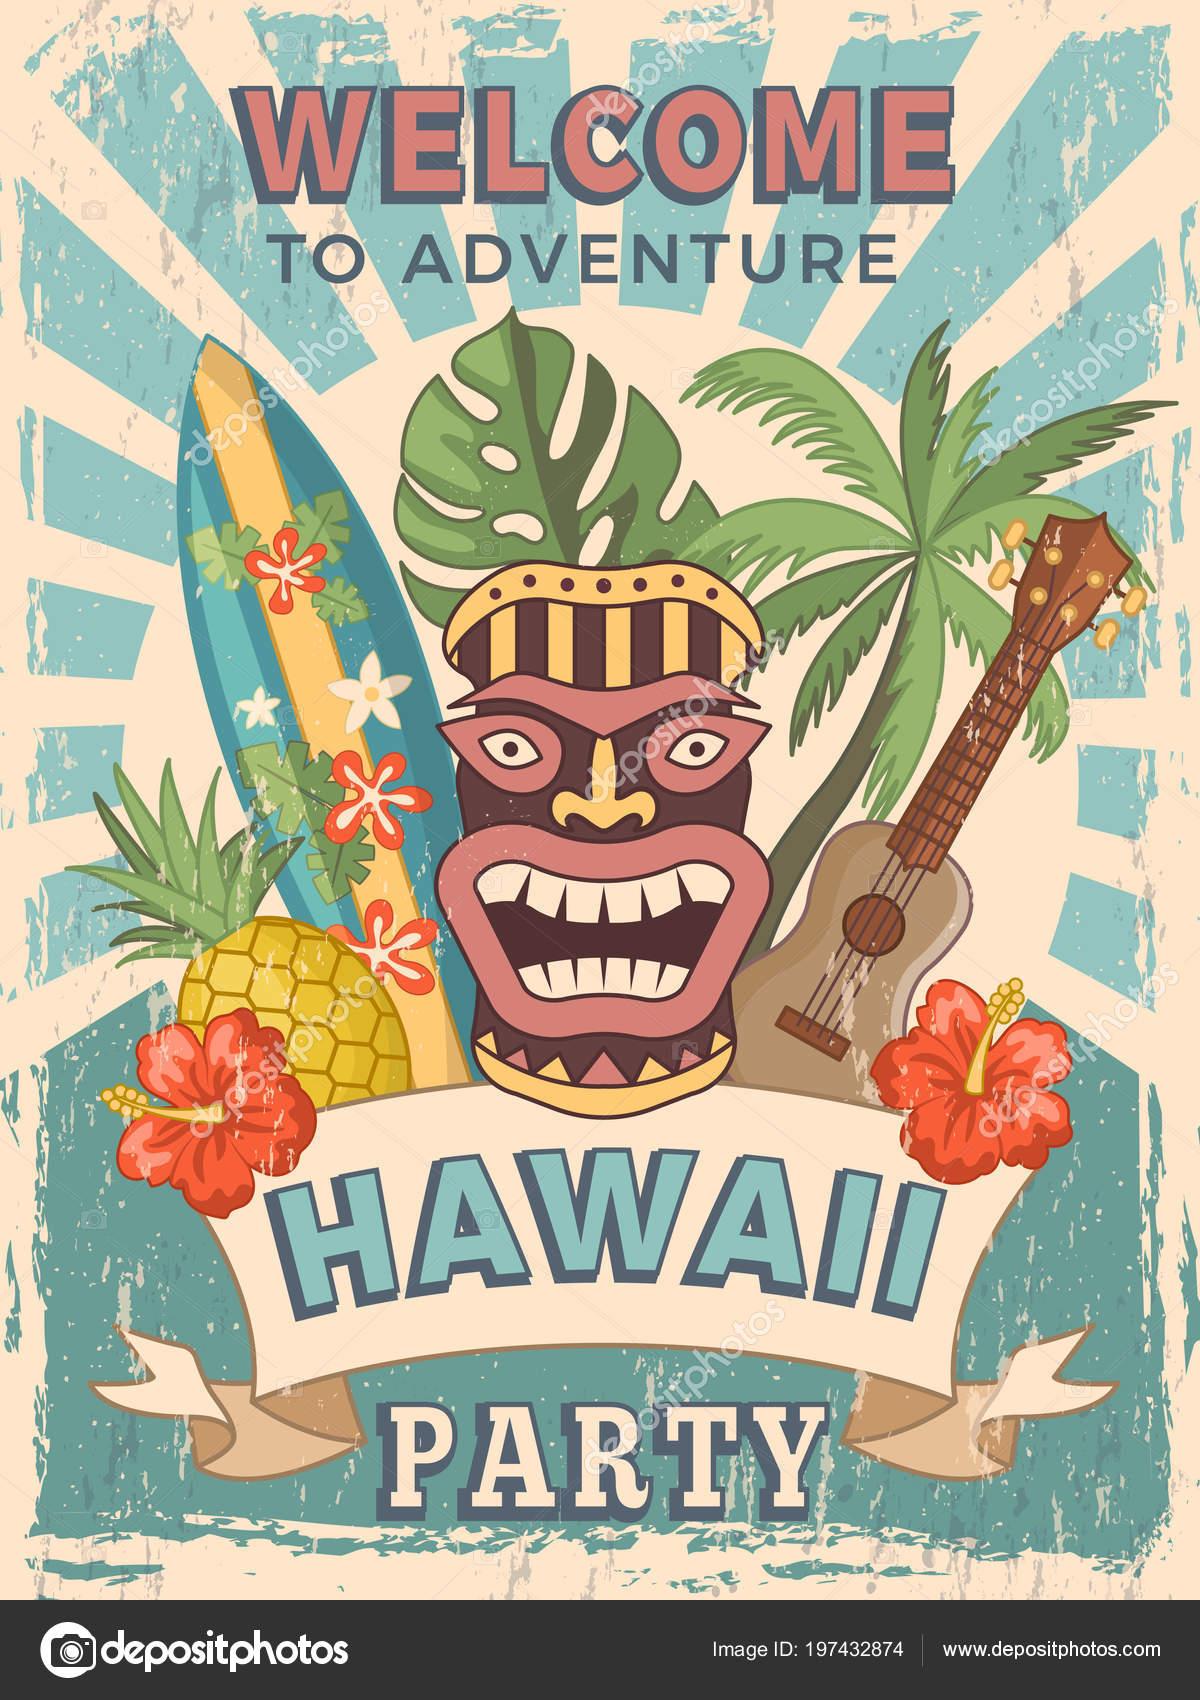 Design template of retro poster invitation for hawaiian party design template of retro poster invitation for hawaiian party stock vector stopboris Choice Image